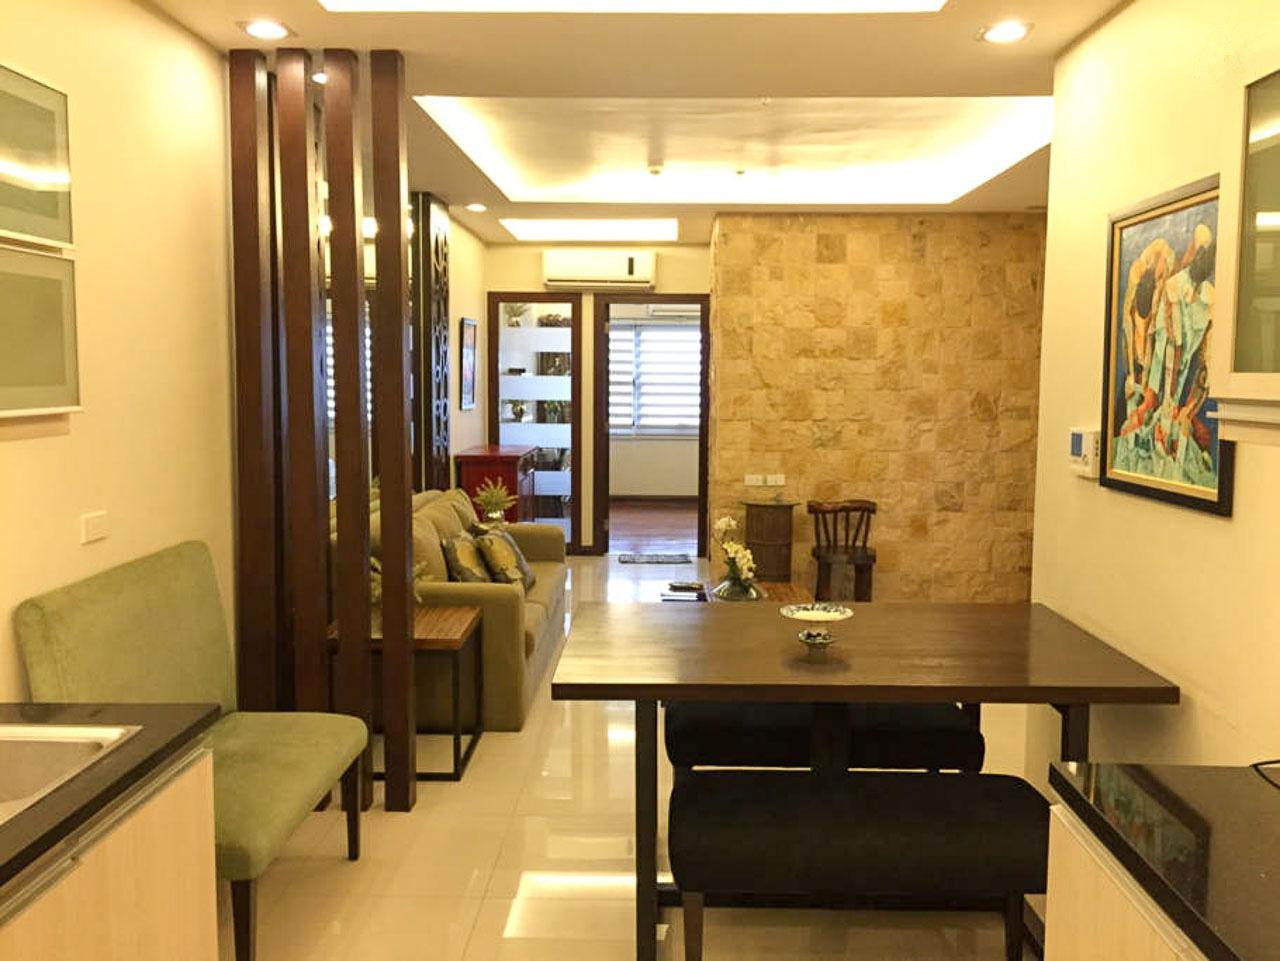 for rent sukhumvit short term bangkok bedroom asoke mrt bts en this rentals condo monthly luxury cbd the and rental spacious in